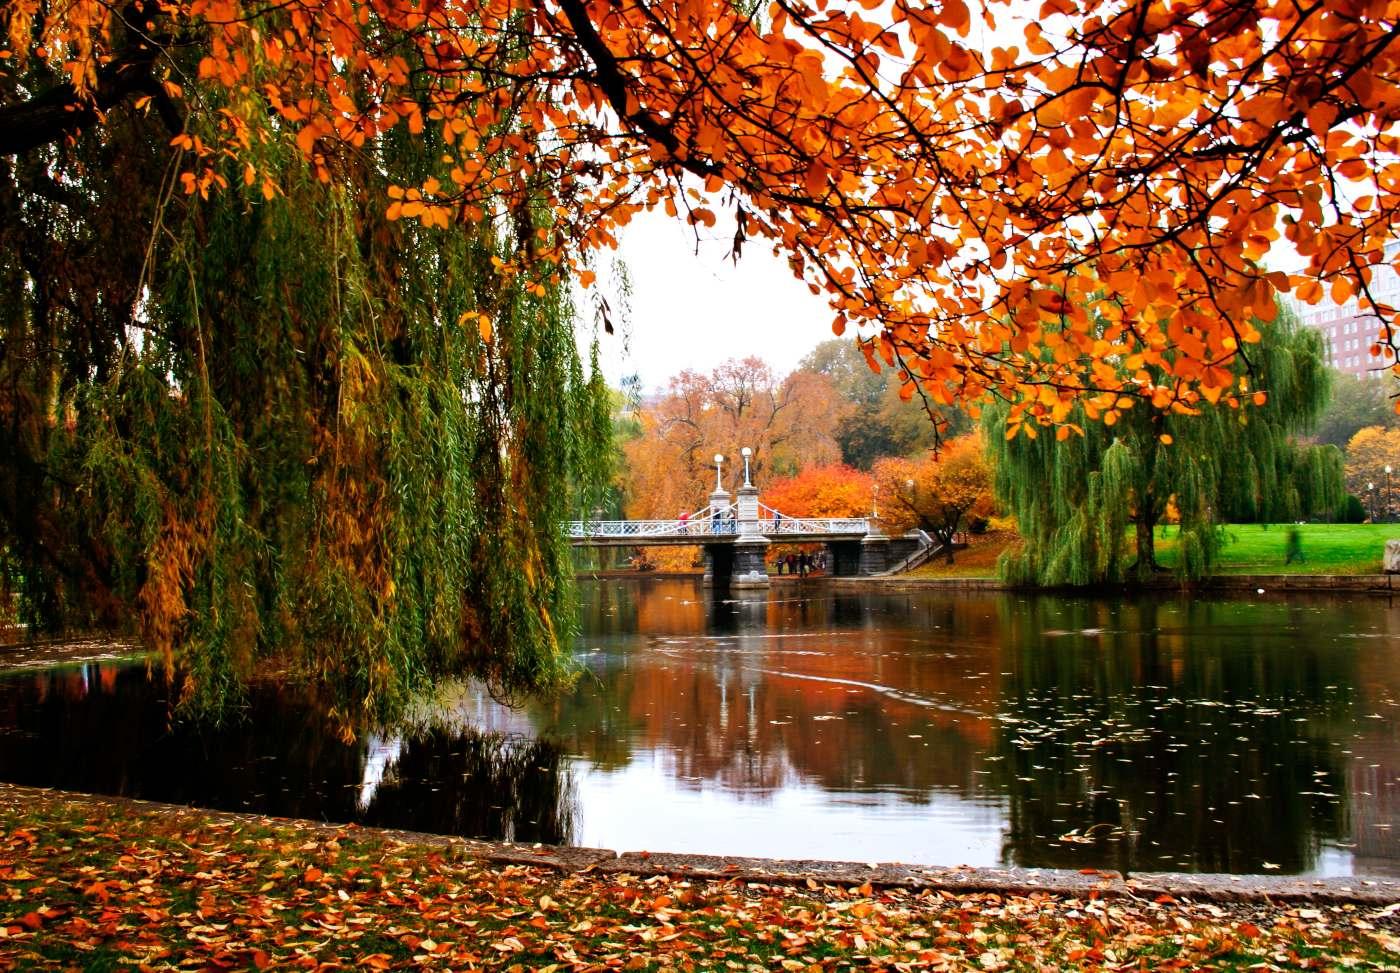 Jardim público em Boston